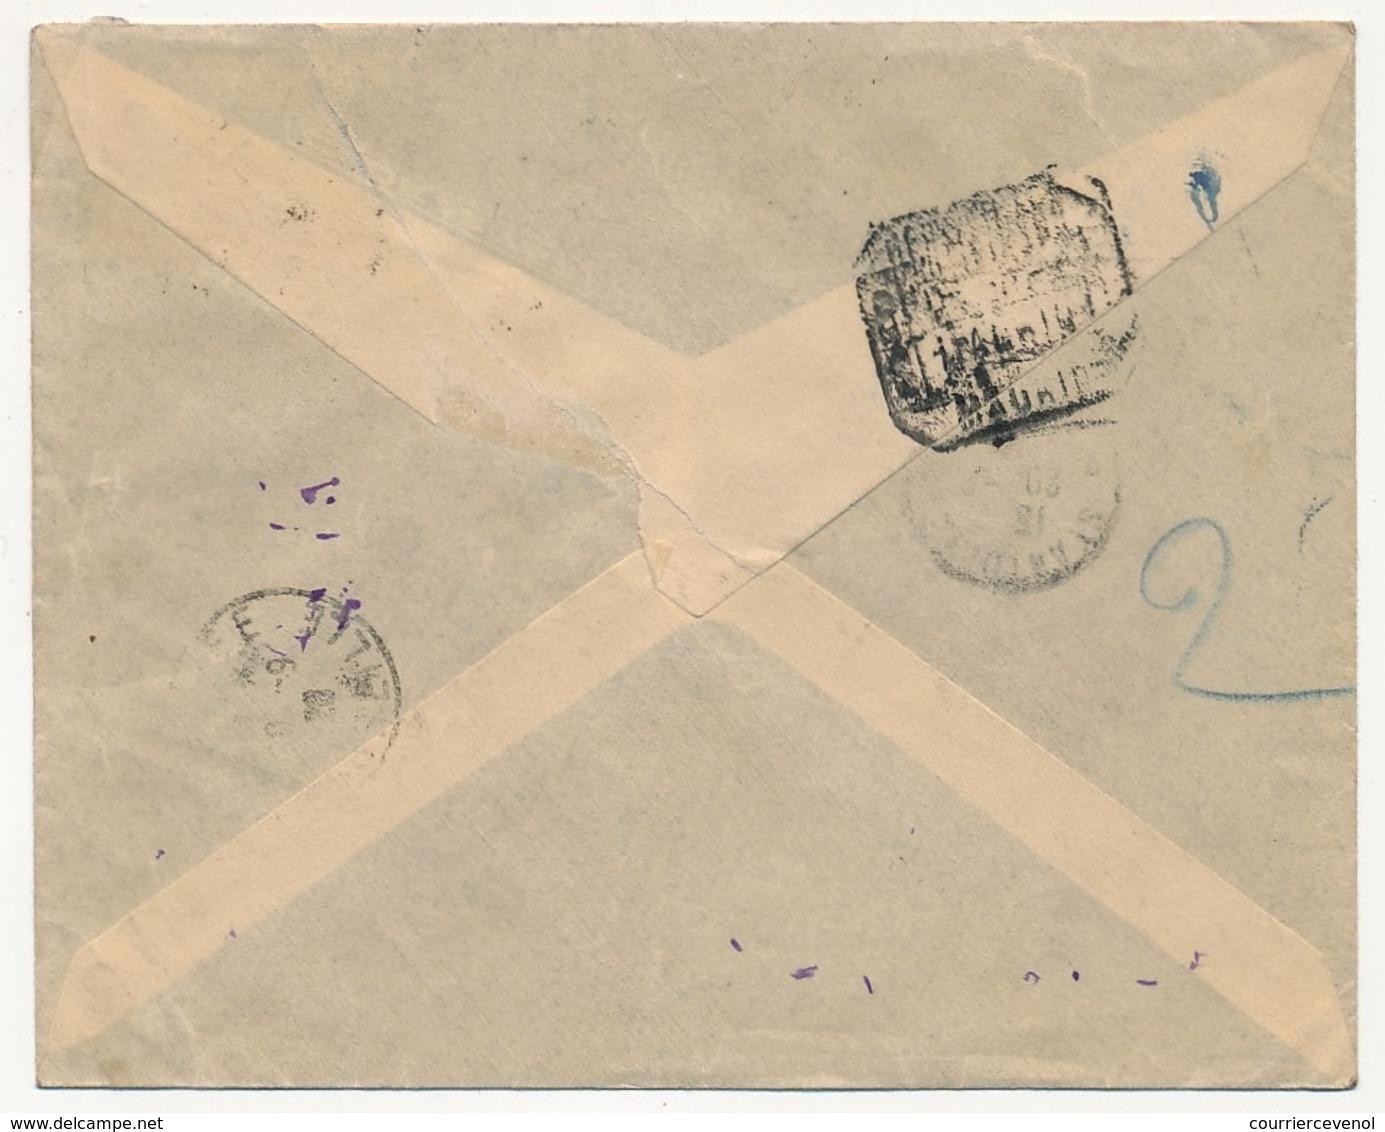 "MAROC ESPAGNOL - Enveloppe Reco. Affr. Composé TP Surchargés ""Zona Protectorado Espanol"" LARACHE 14 Sep 1926 - Spanish Morocco"